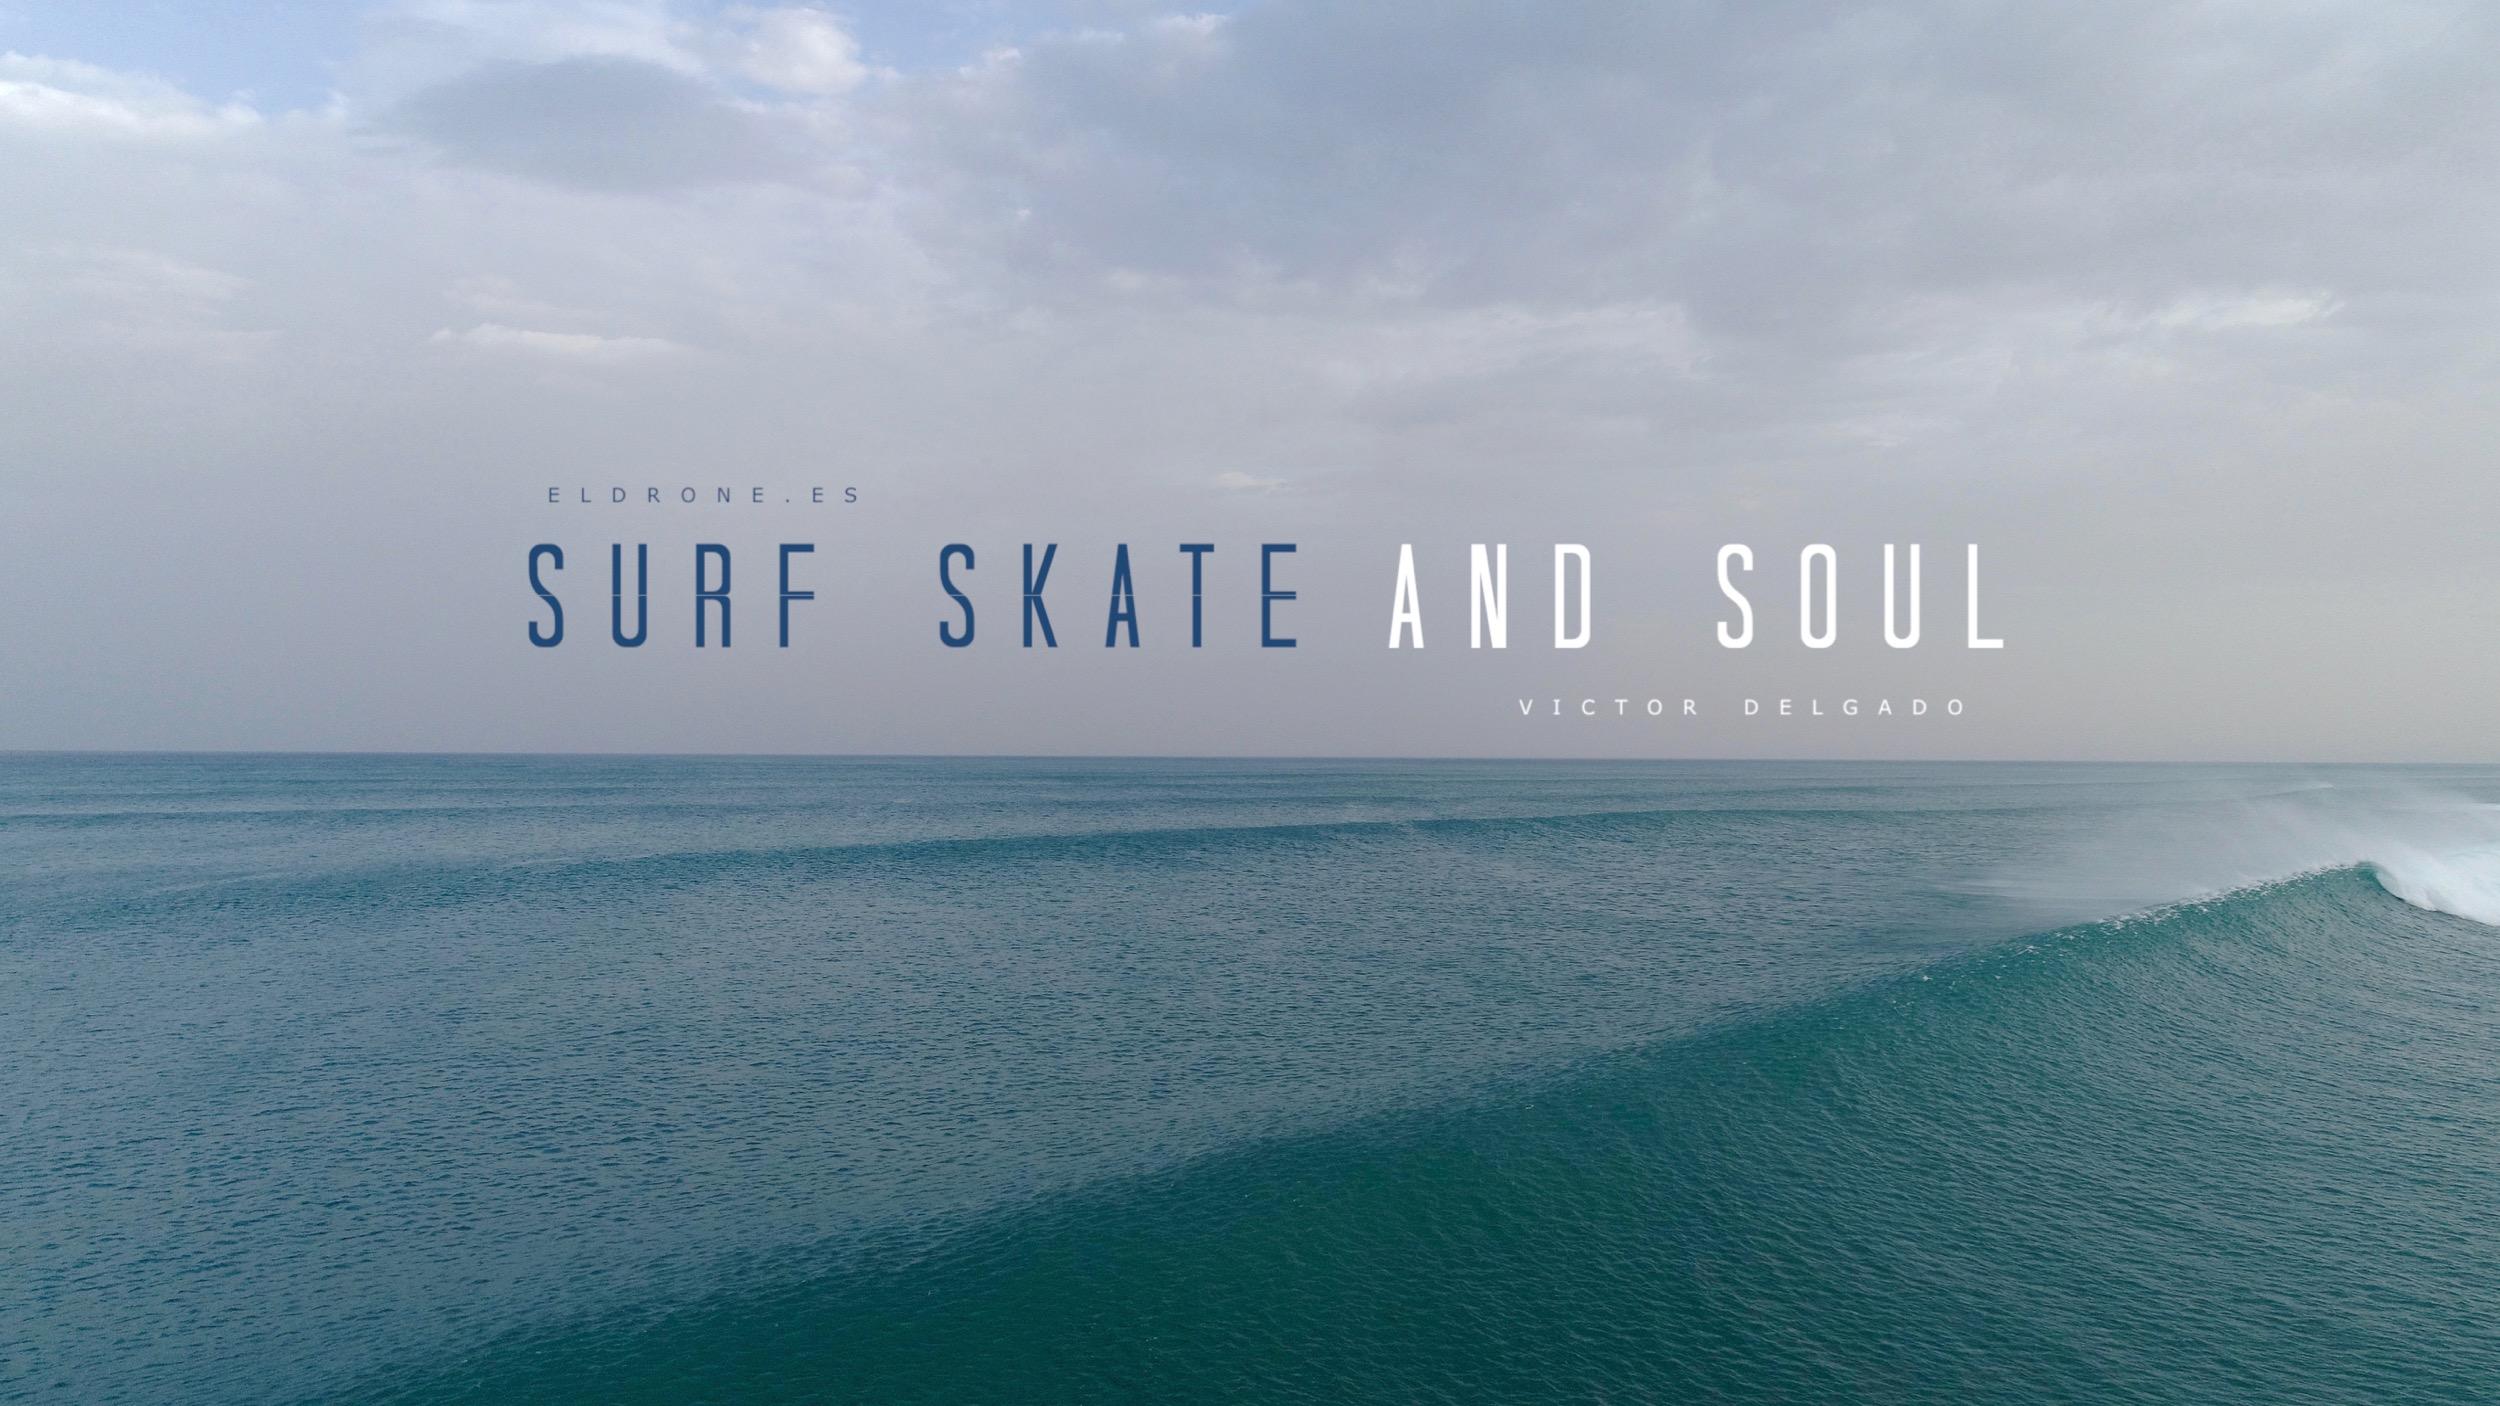 surf-skate-and-soul-cantabria-drone-film